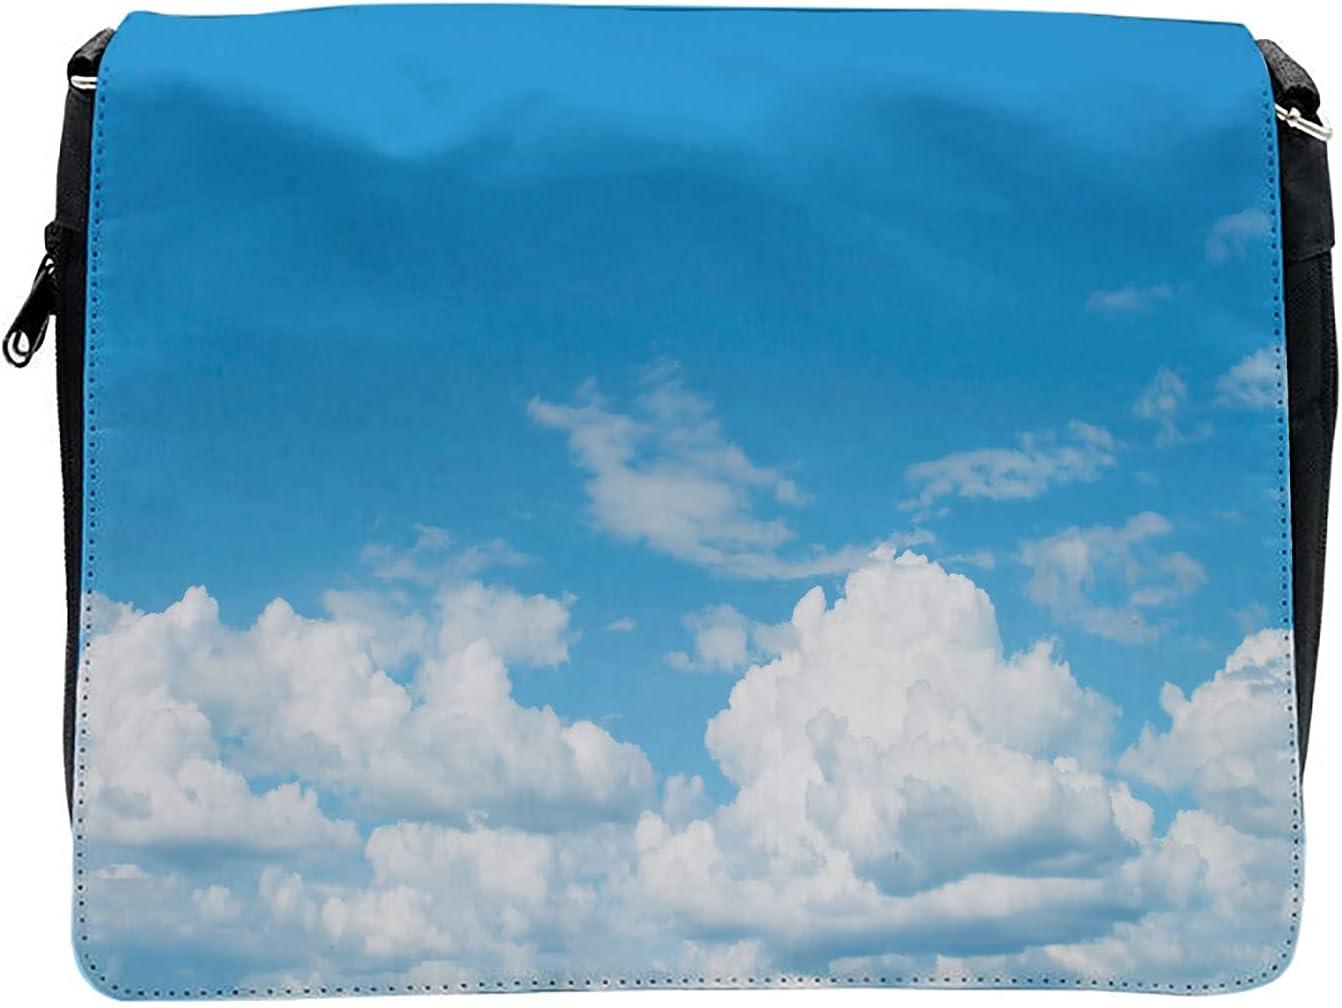 Ambesonne Blue White Cross Body Messenger Bag, Cloudy Calming Scene, Unisex